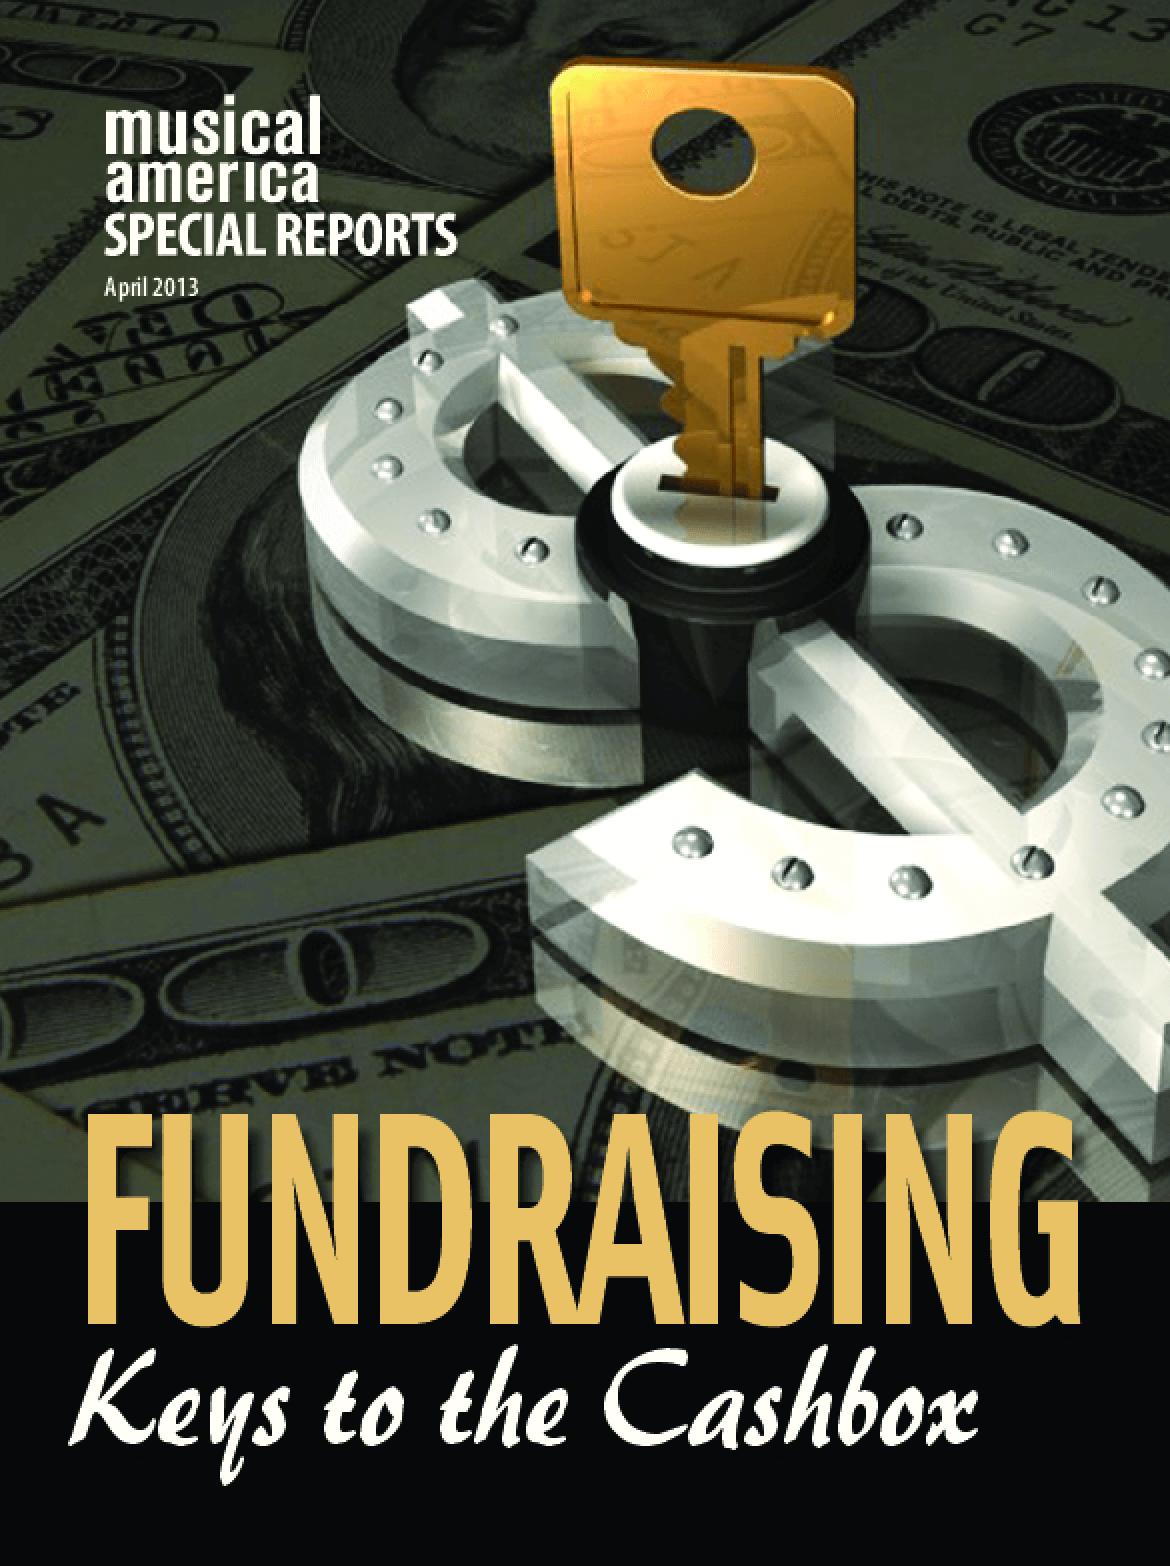 Fundraising: Keys to the Cashbox